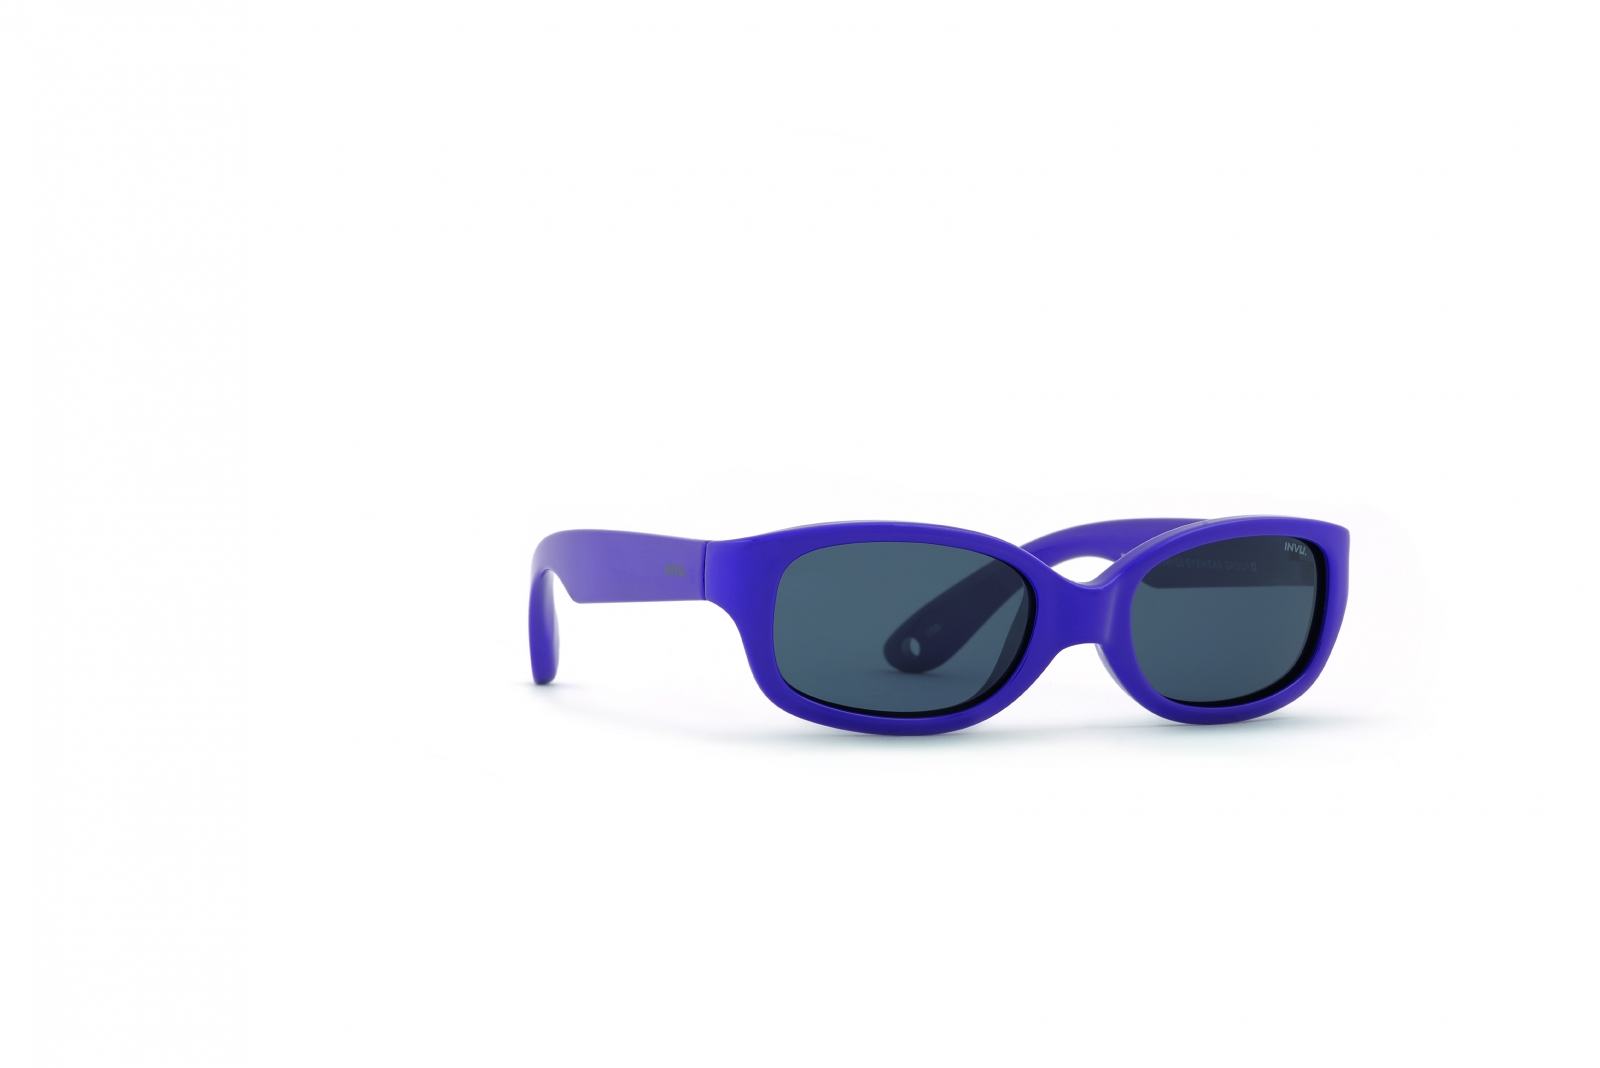 INVU. Kids K2914D - Slnečné okuliare pre deti 1-3 r.